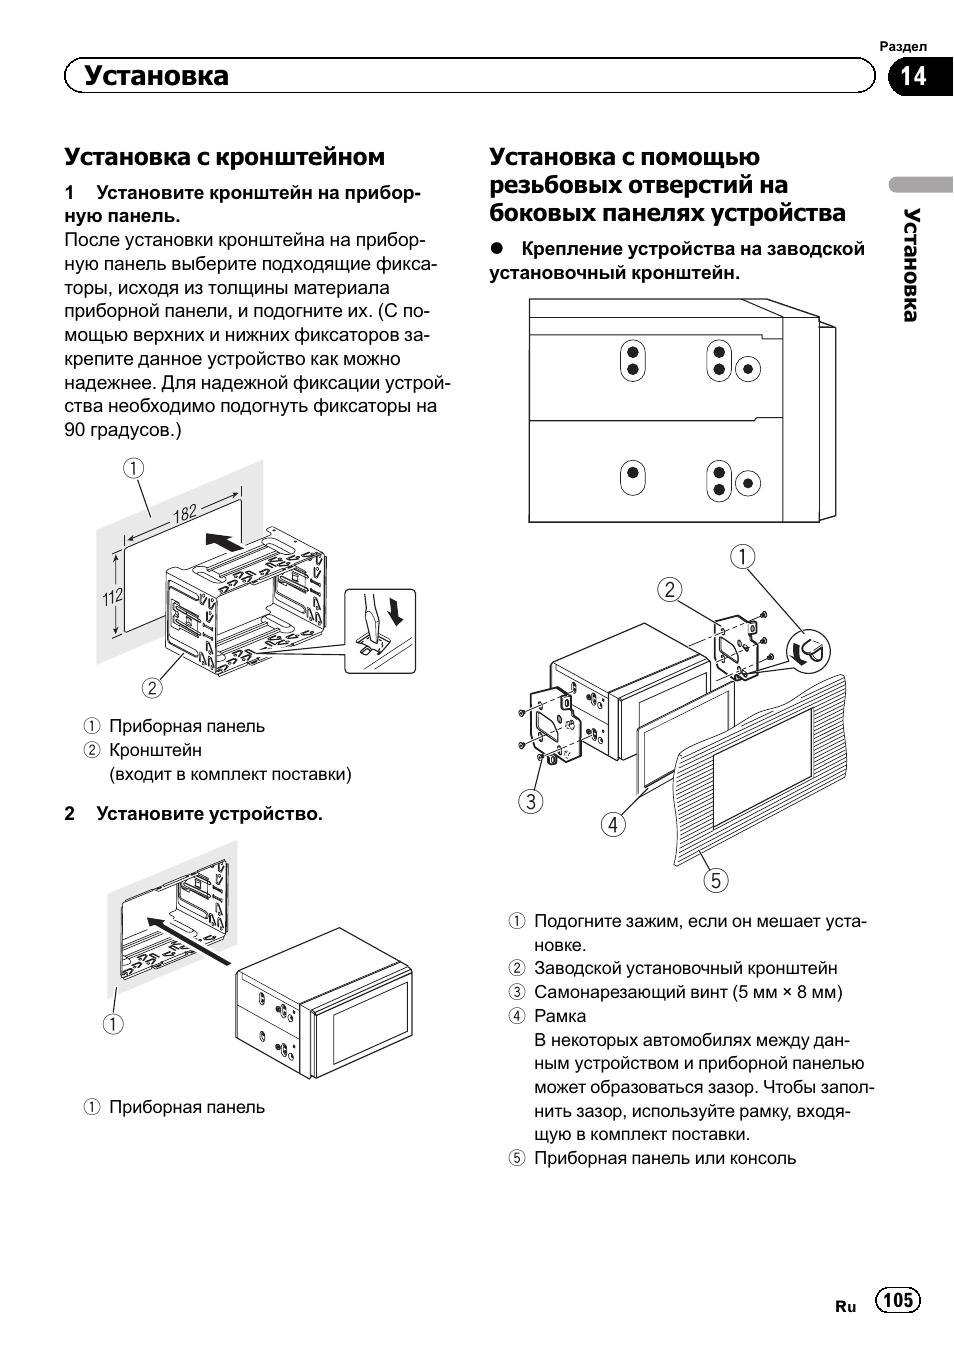 Инструкция по установке установке pioneer